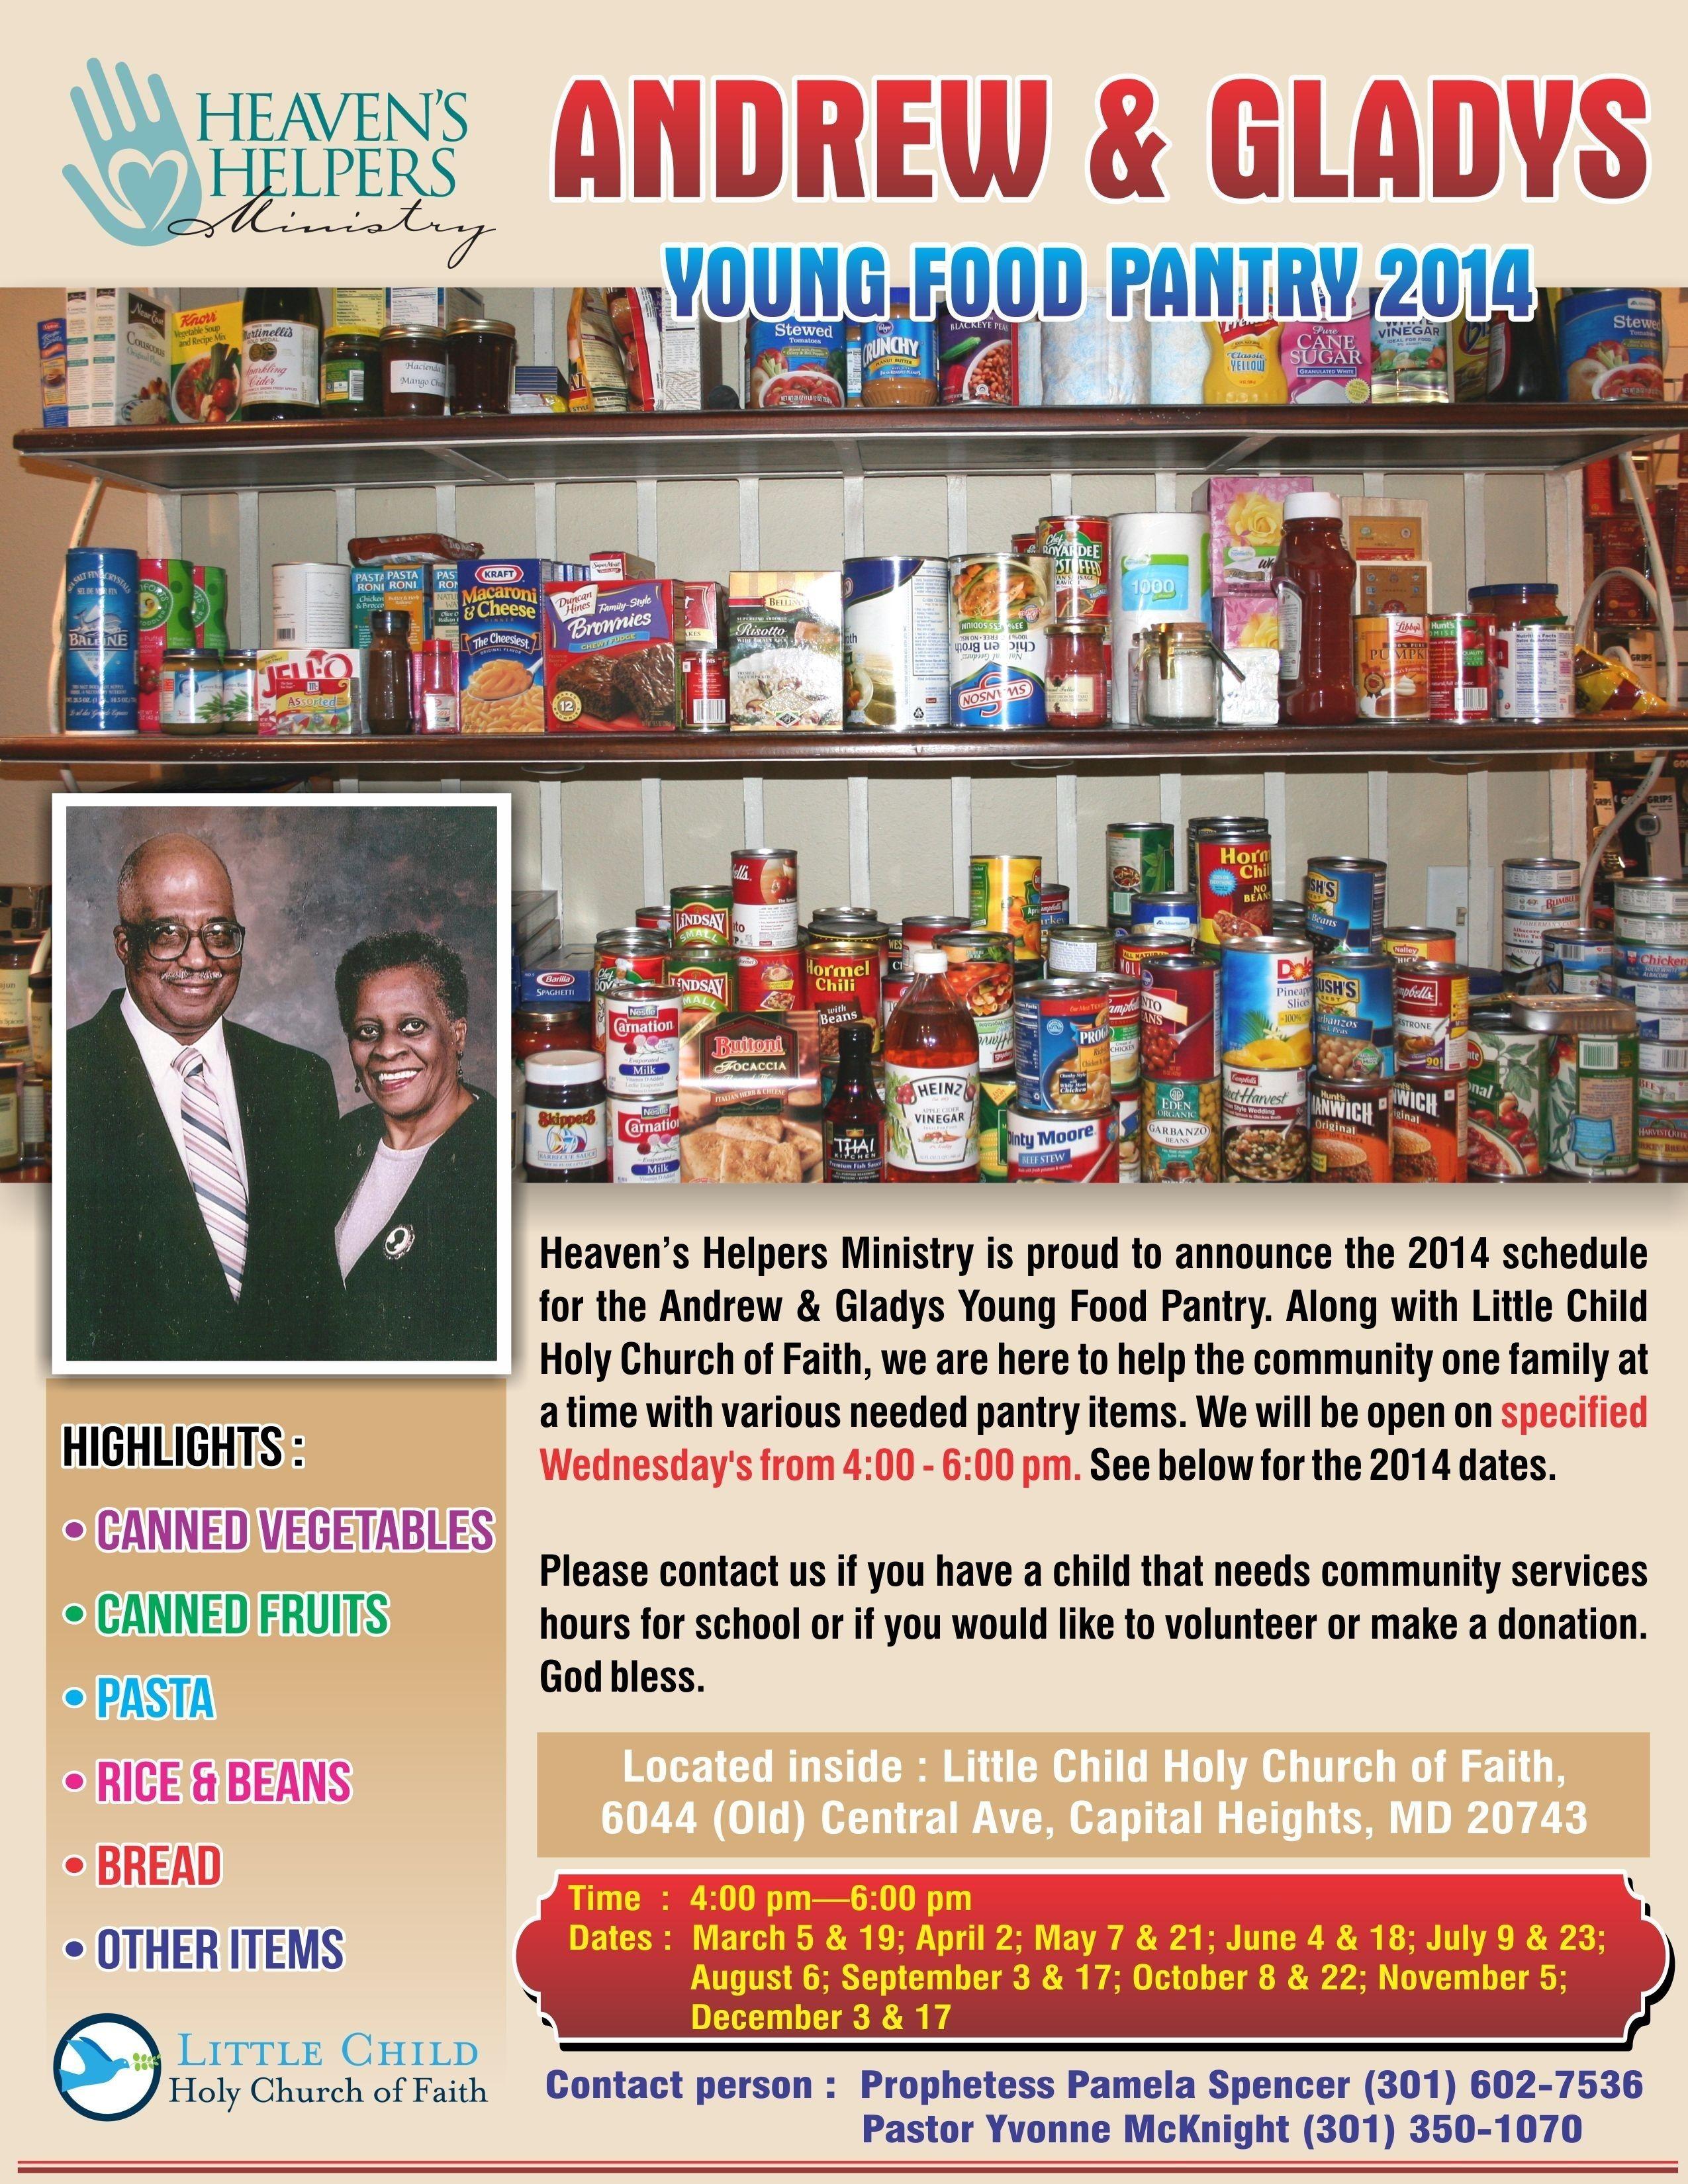 Heaven's Helpers Ministry